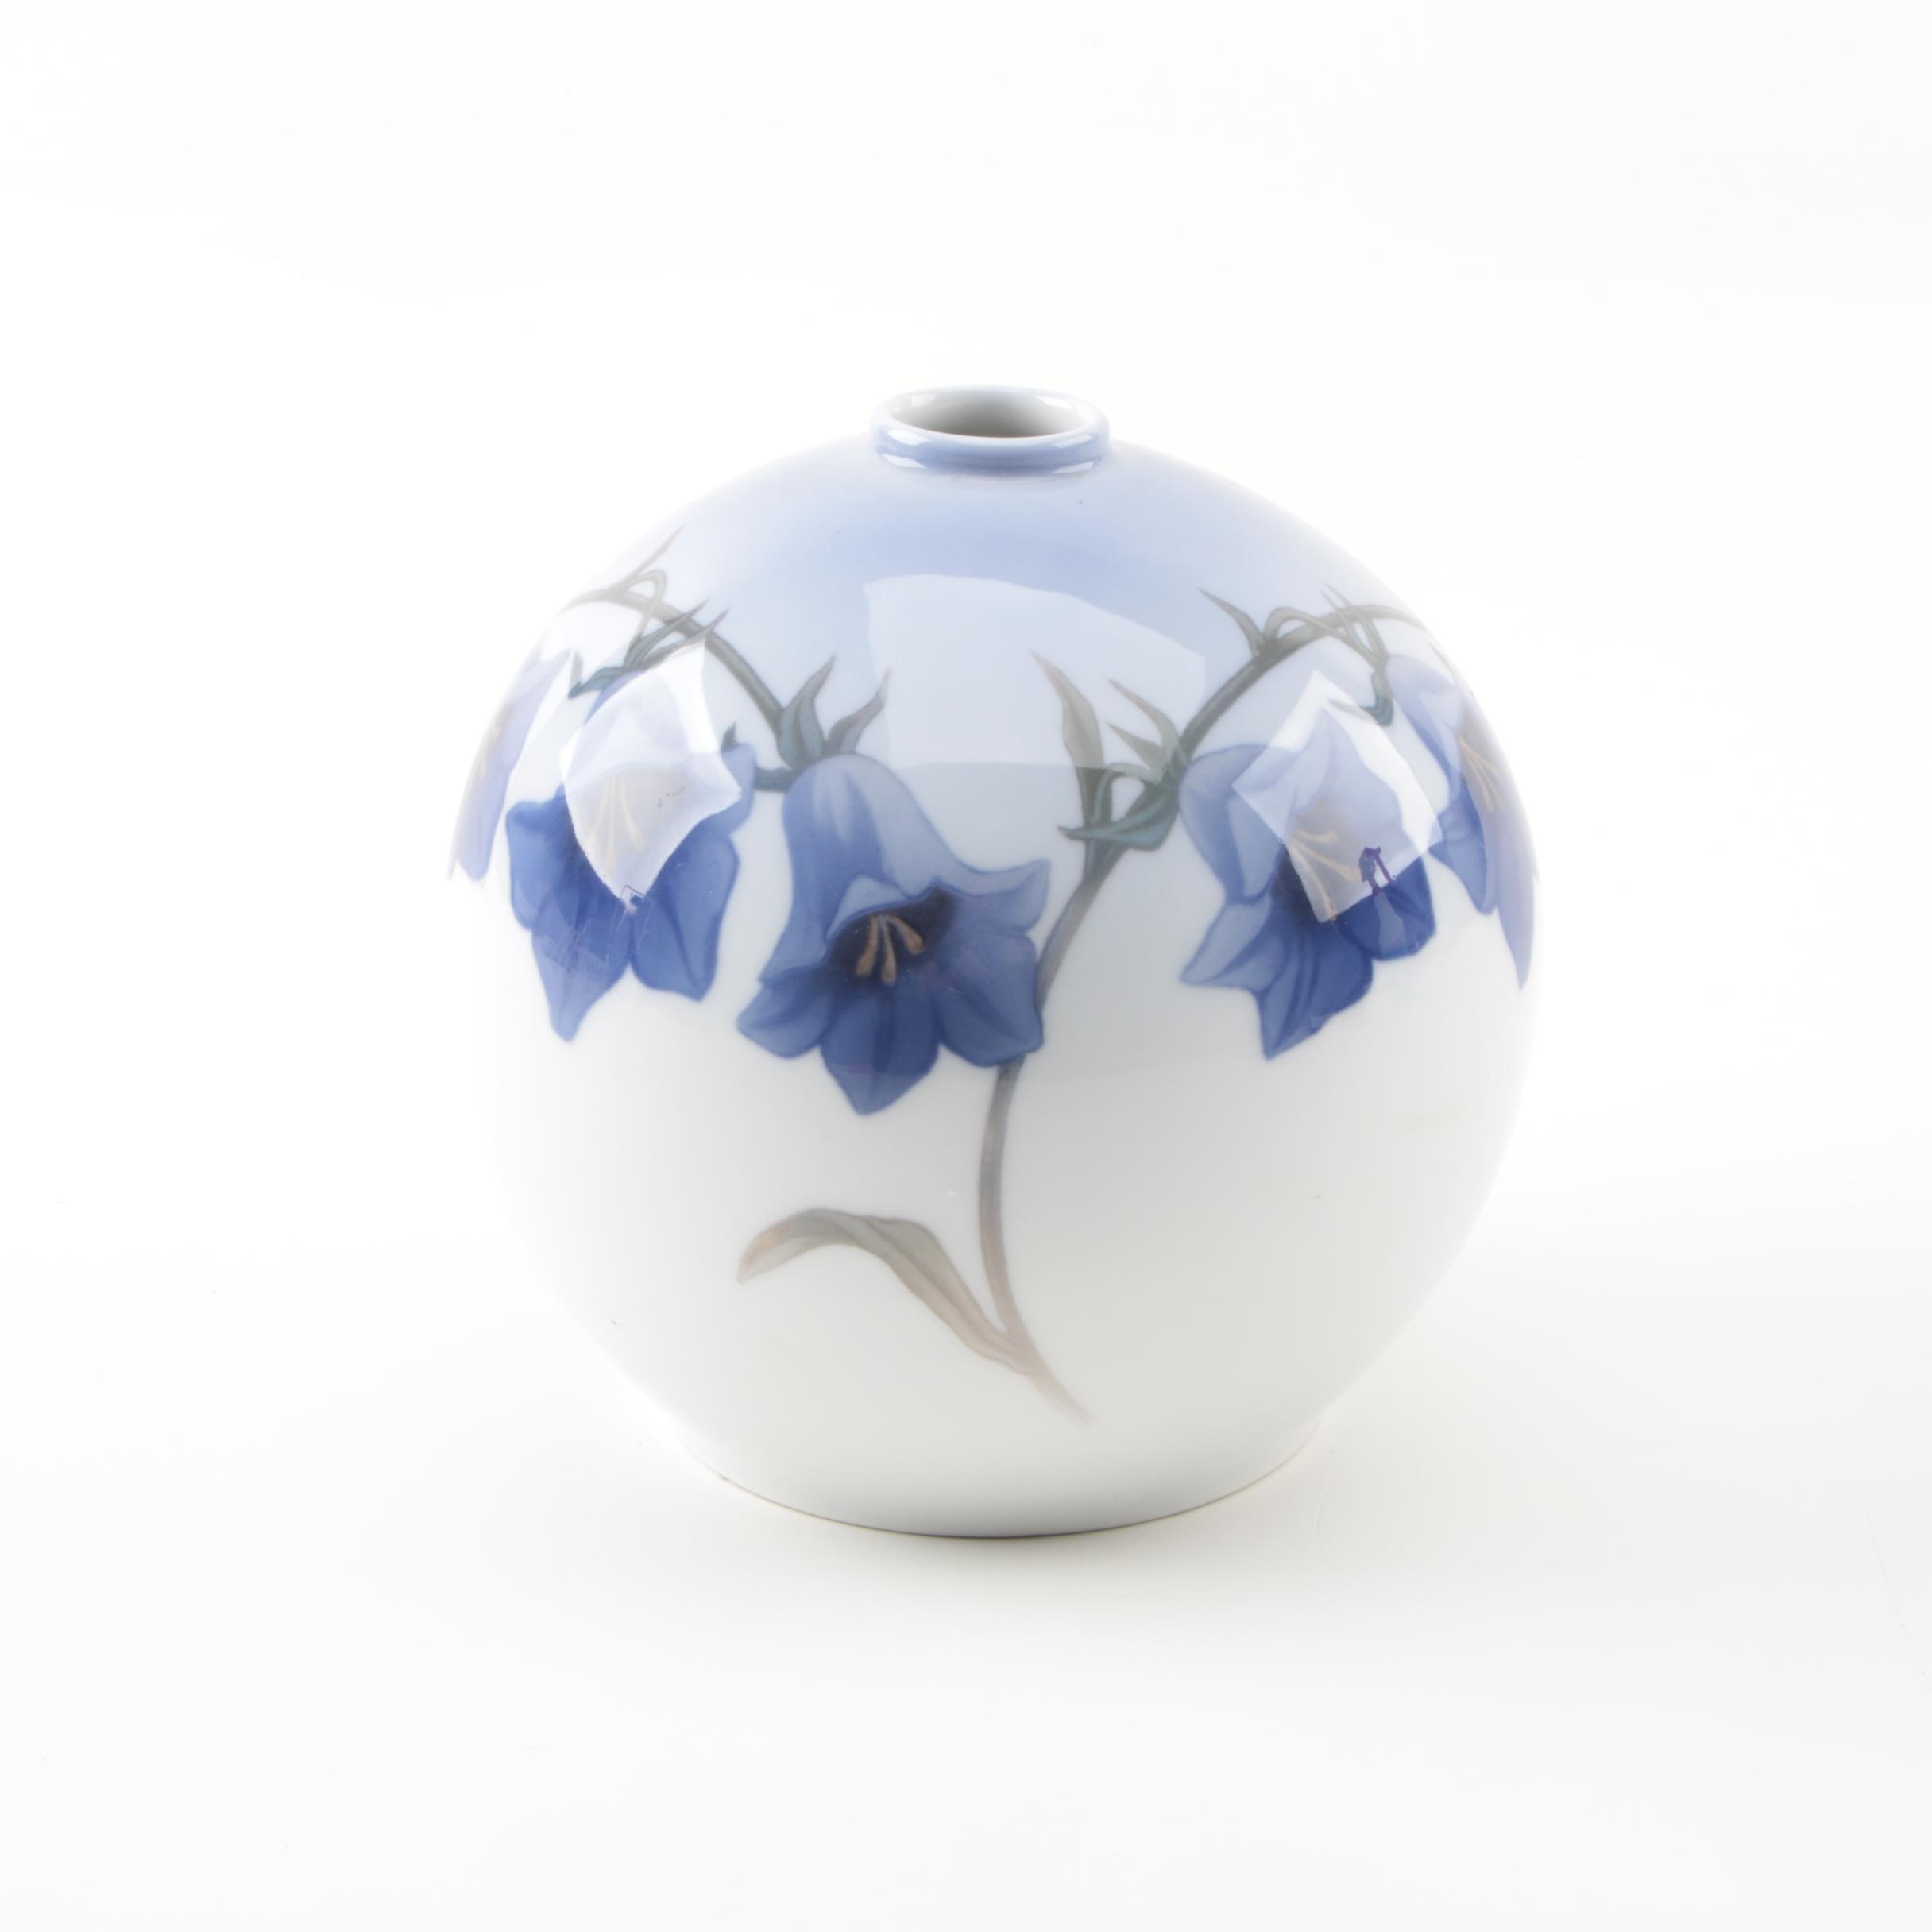 Circa 1920s Royal Copenhagen Porcelain Vase with Bluebells